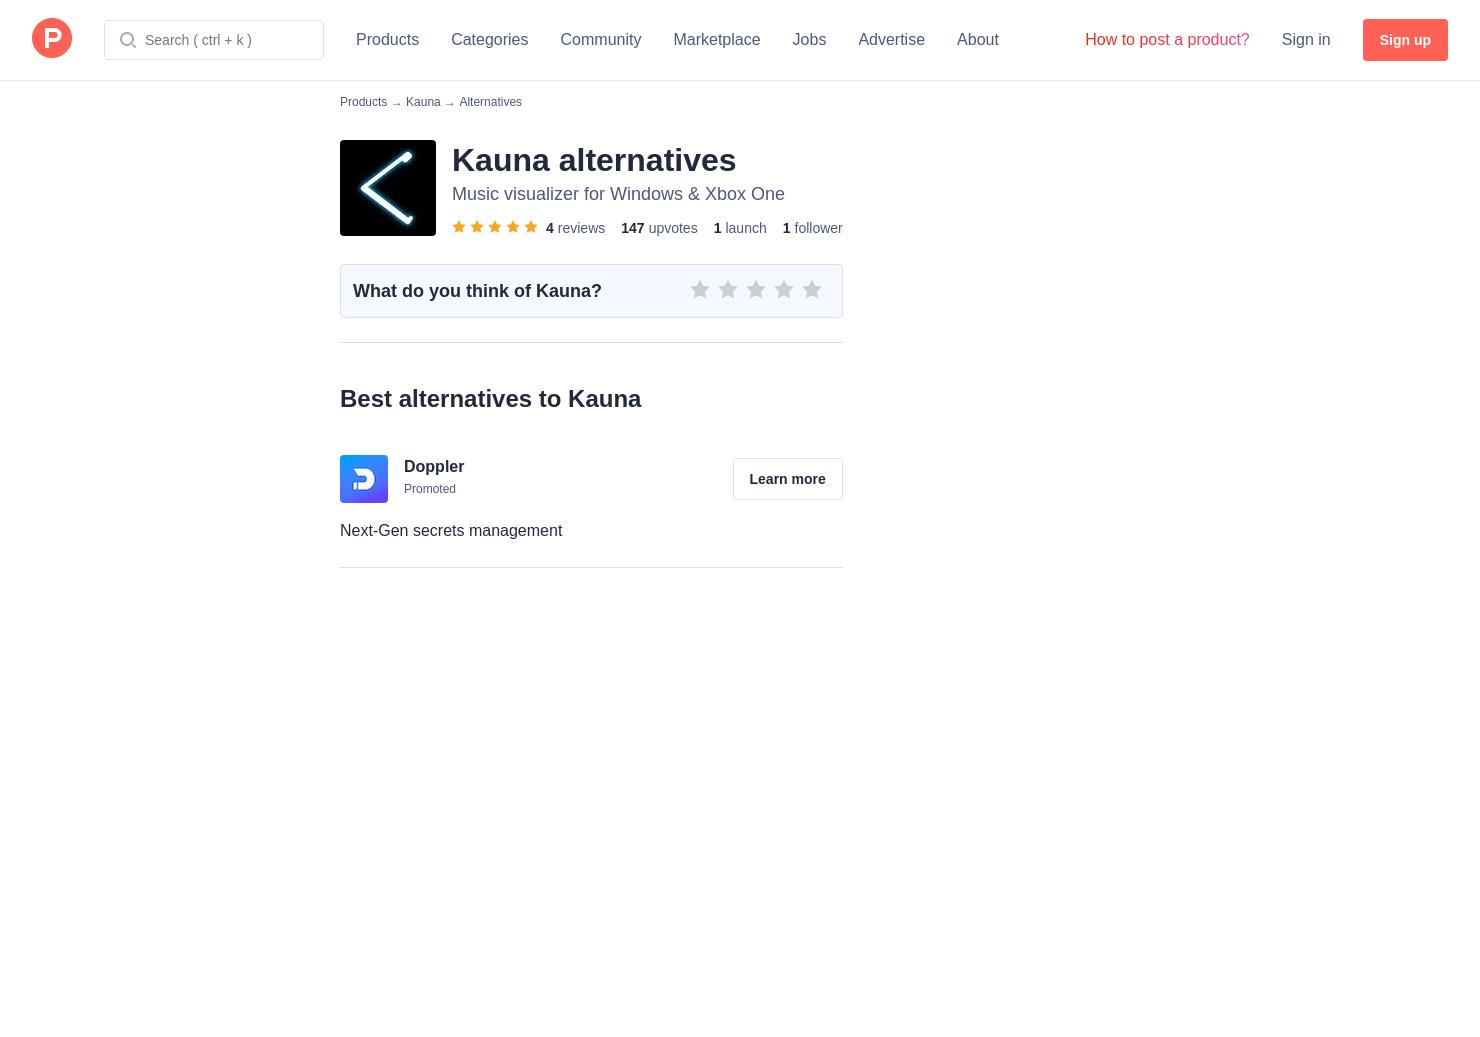 6 Alternatives to Kauna for Xbox One, Windows | Product Hunt